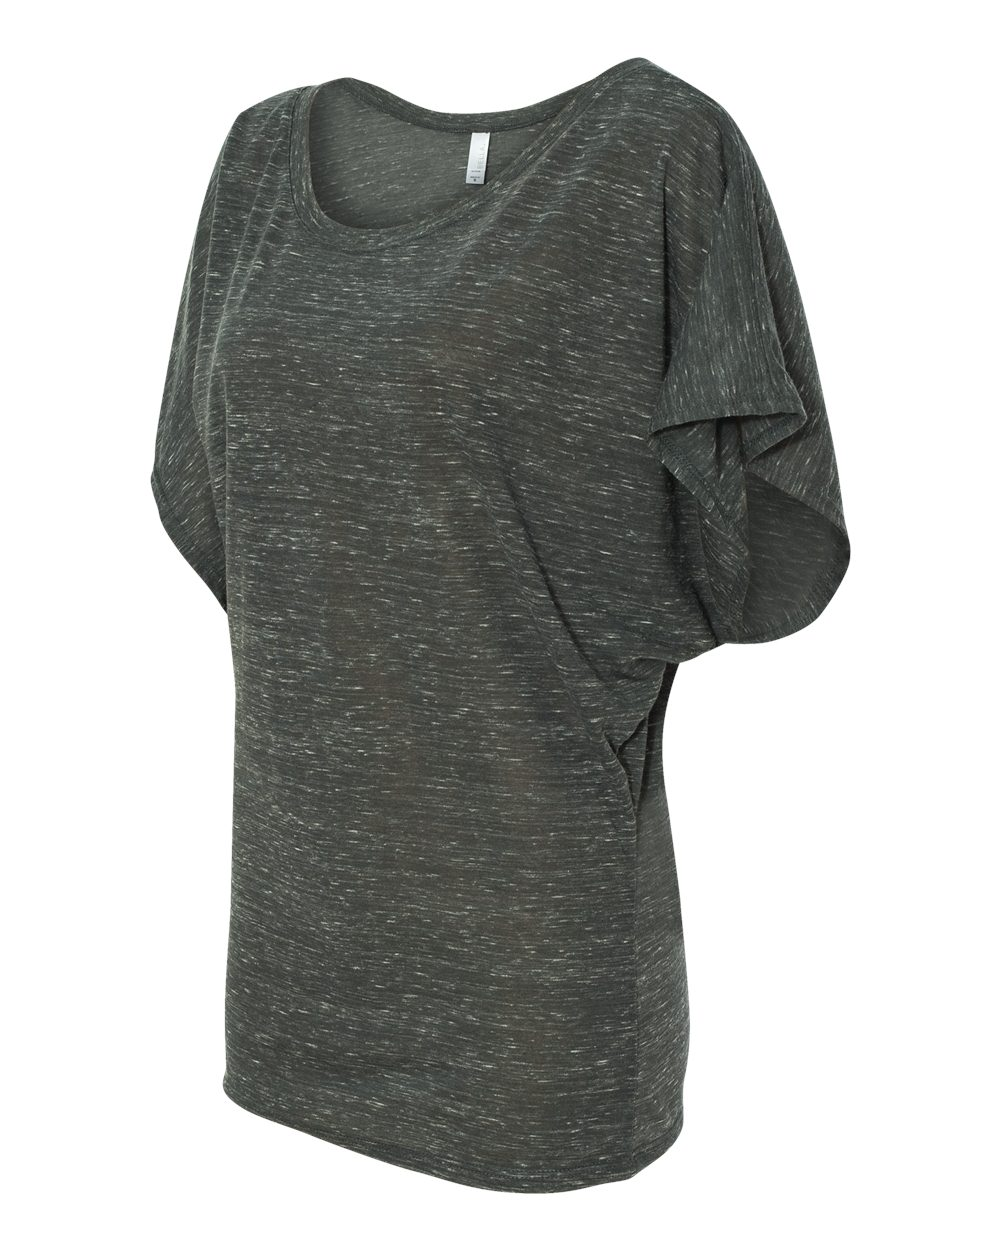 Bella-Canvas-Women-039-s-Flowy-Draped-Sleeve-Dolman-T-Shirt-8821-S-2XL thumbnail 27